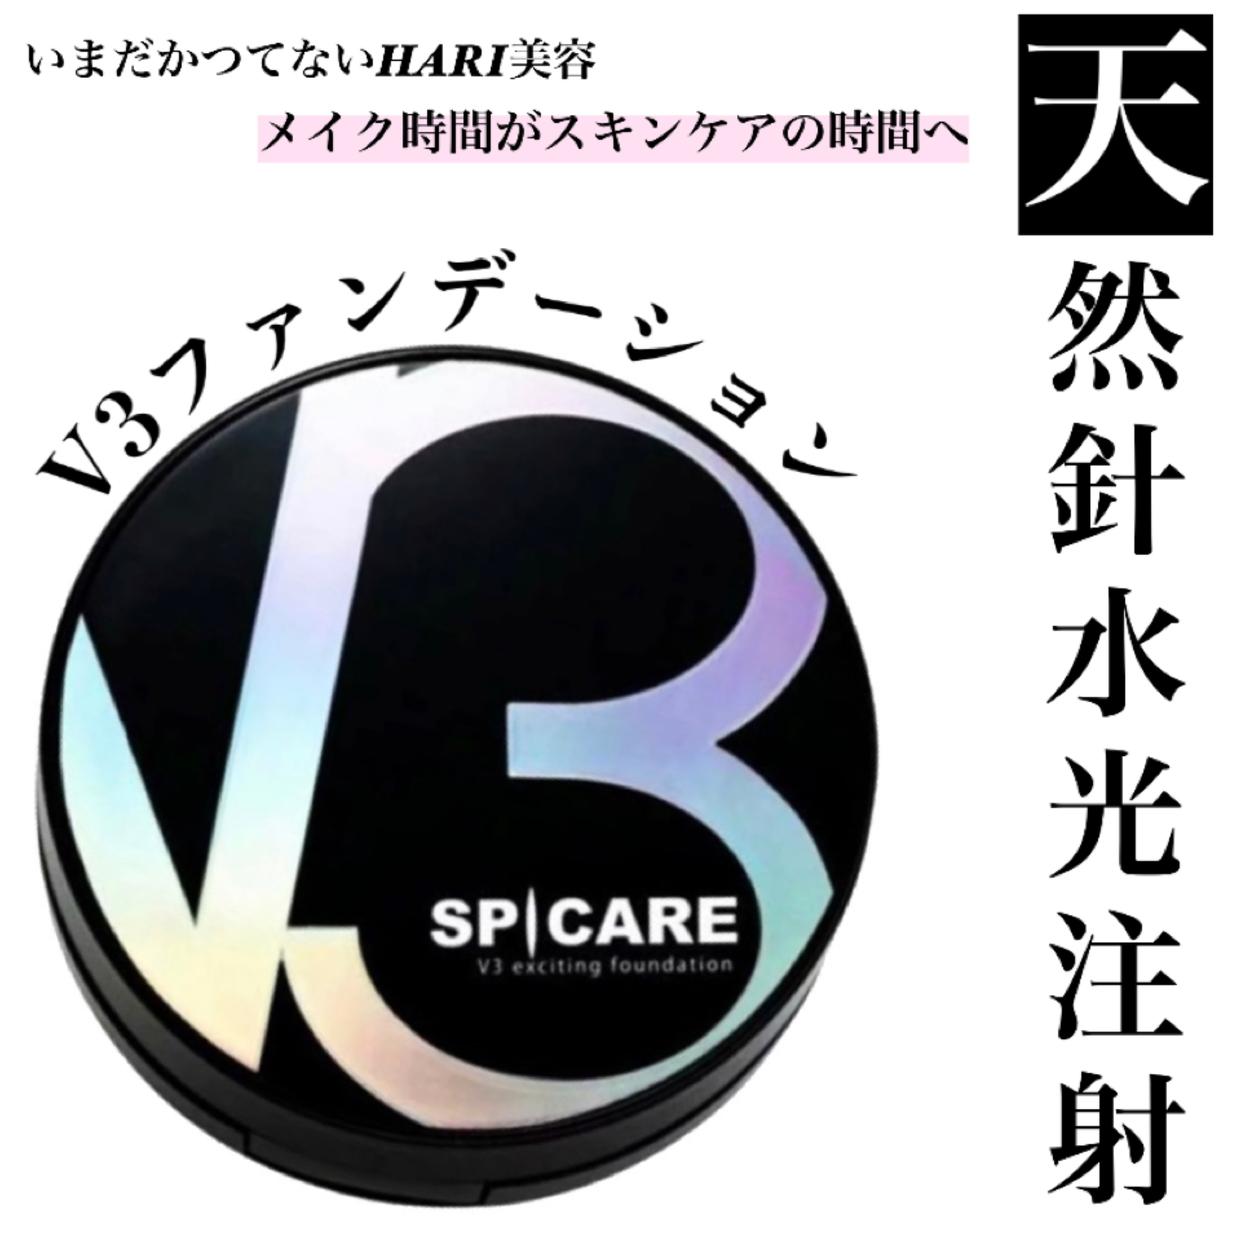 SPICARE(スピケア)V3エキサイティングファンデーションを使った星 裕実さんのクチコミ画像